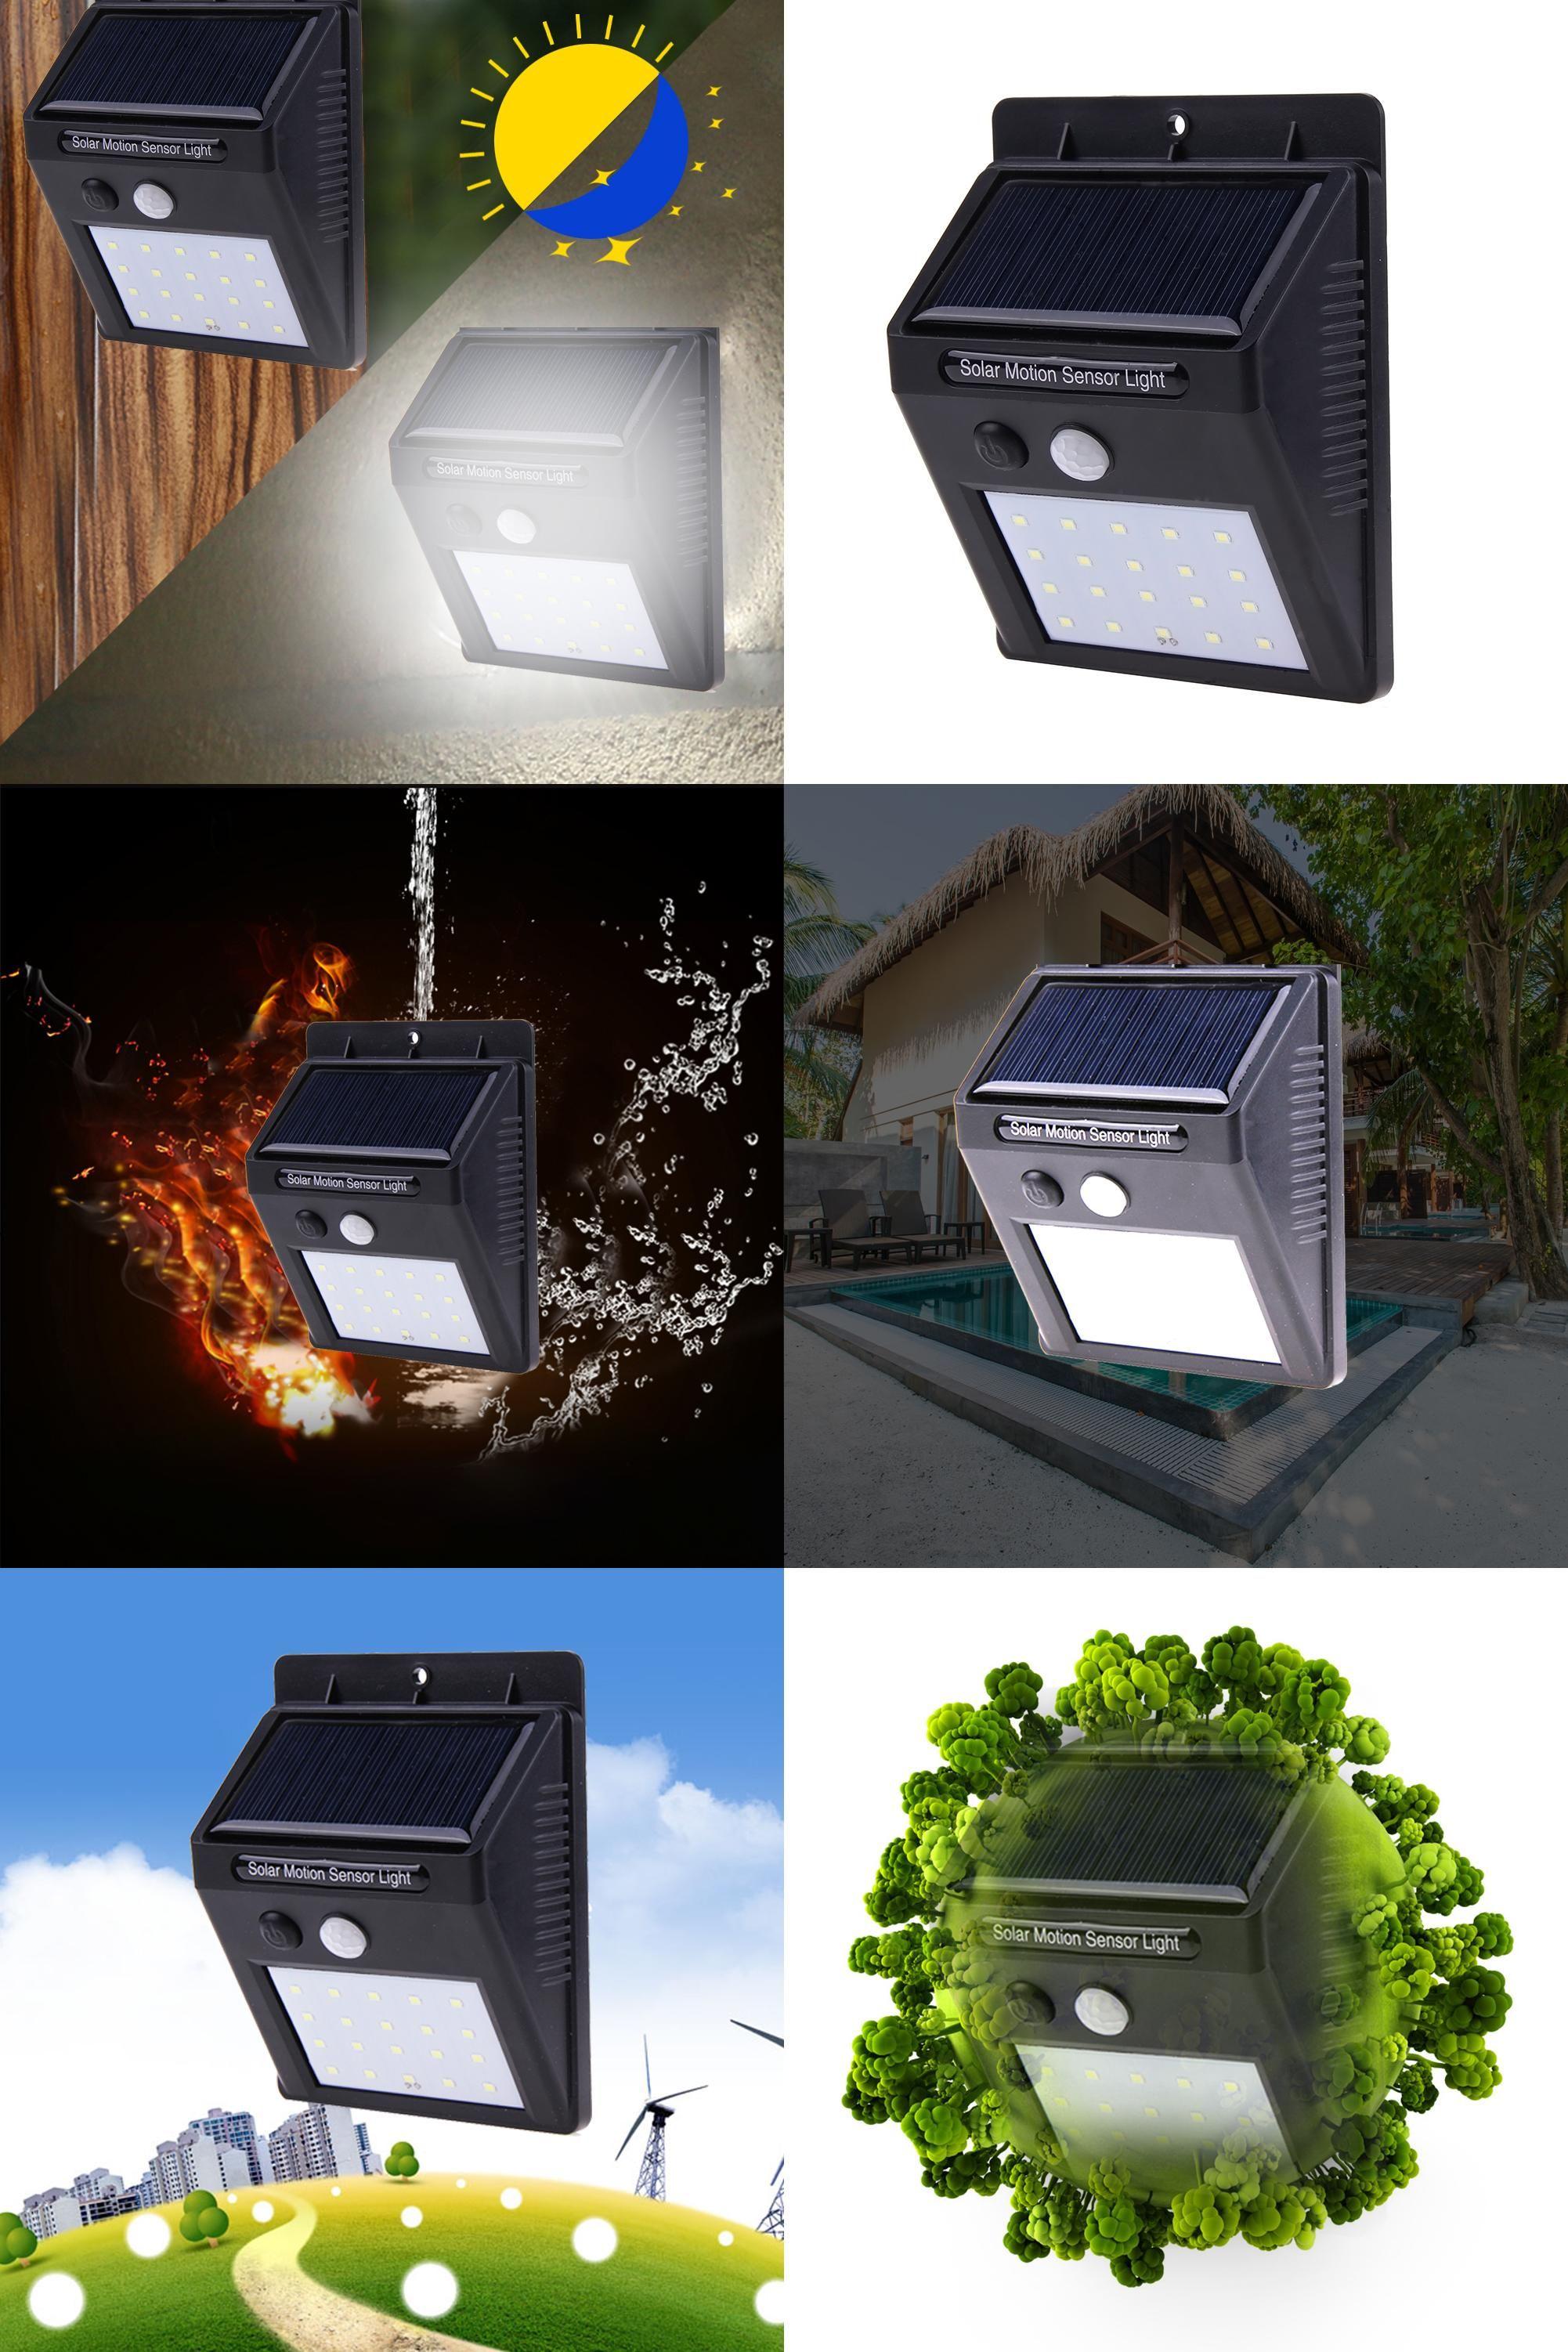 Visit To Buy 20 Led Solar Power Light Pir Motion Sensor Wall Light Outdoor Waterproof Garden Solar Powered Lights Solar Garden Lanterns Outdoor Wall Lighting